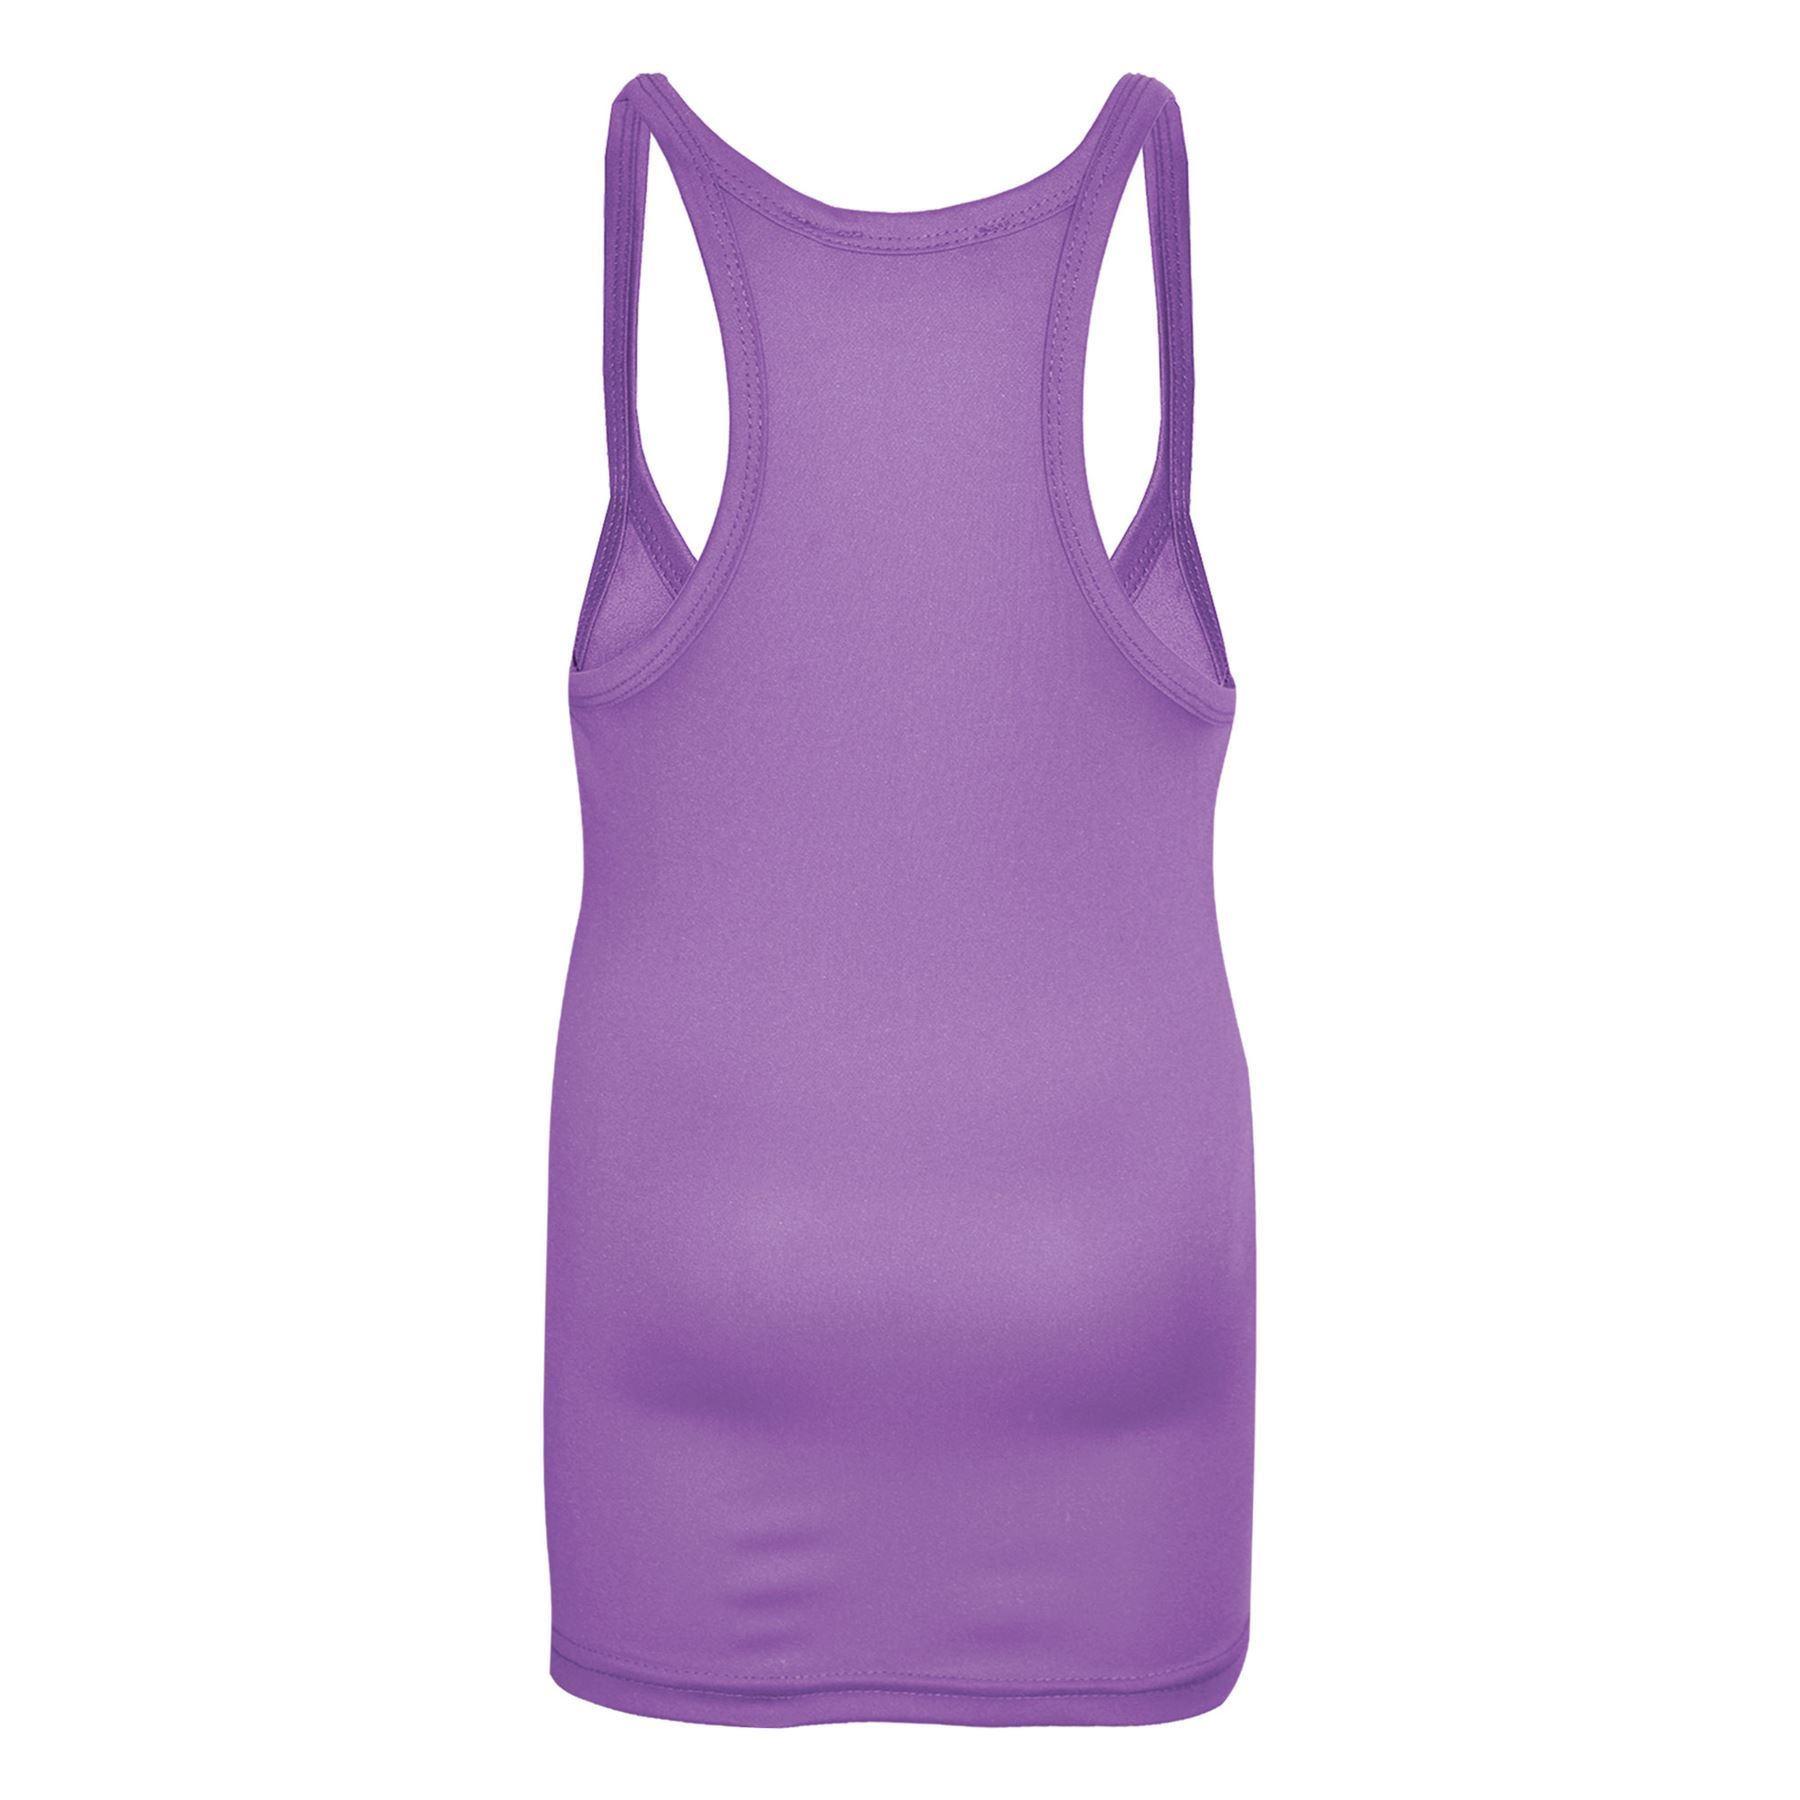 Girls-Vest-Kids-Stylish-Racer-Back-Fashion-Top-T-Shirt-Age-5-6-7-8-9-10-11-12-Y